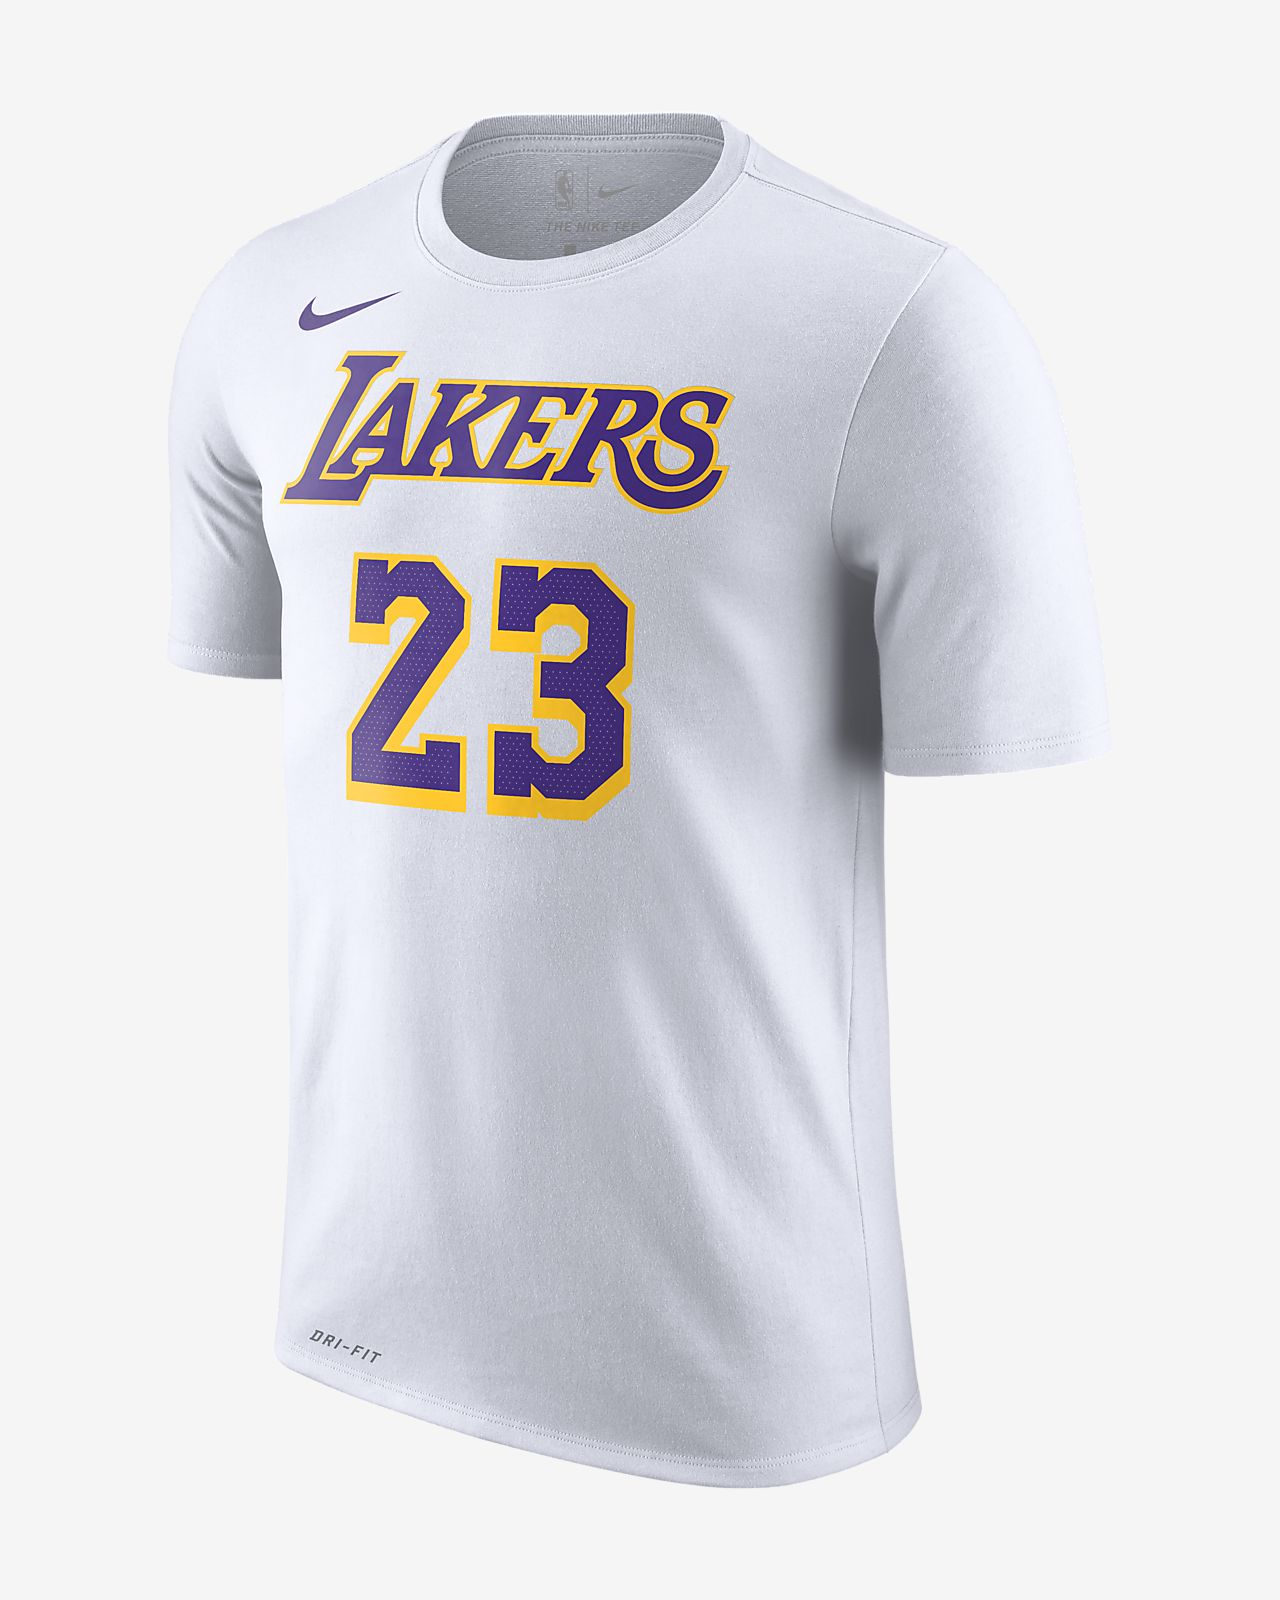 Los Angeles Lakers Nike Dri-FIT NBA-s póló